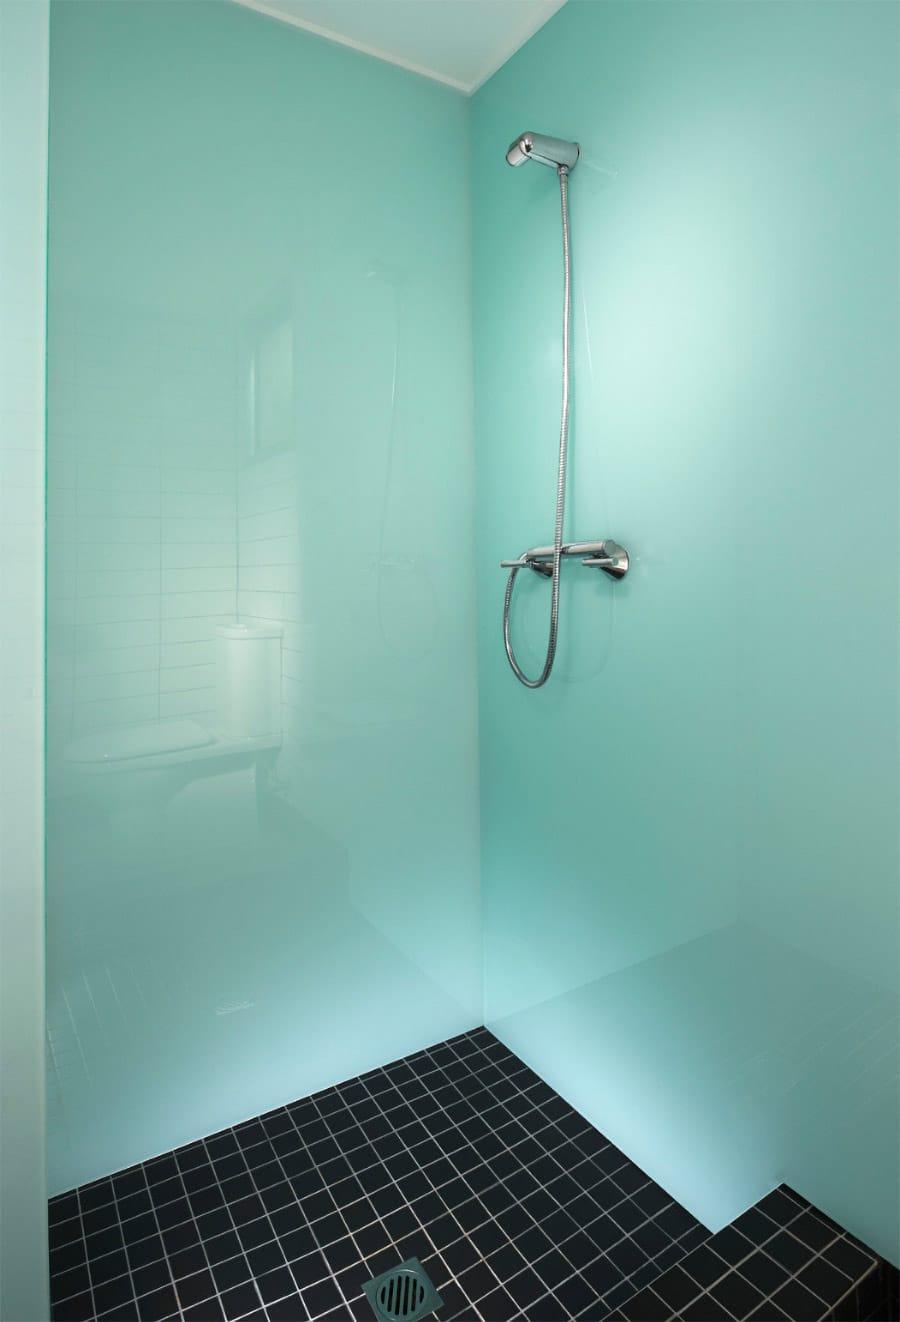 light blue high gloss acrylic shower wall panels | Innovate Building solutions | #Highgloss #AcrylicWallPanels #ShowerPanels #HighGlossPanels